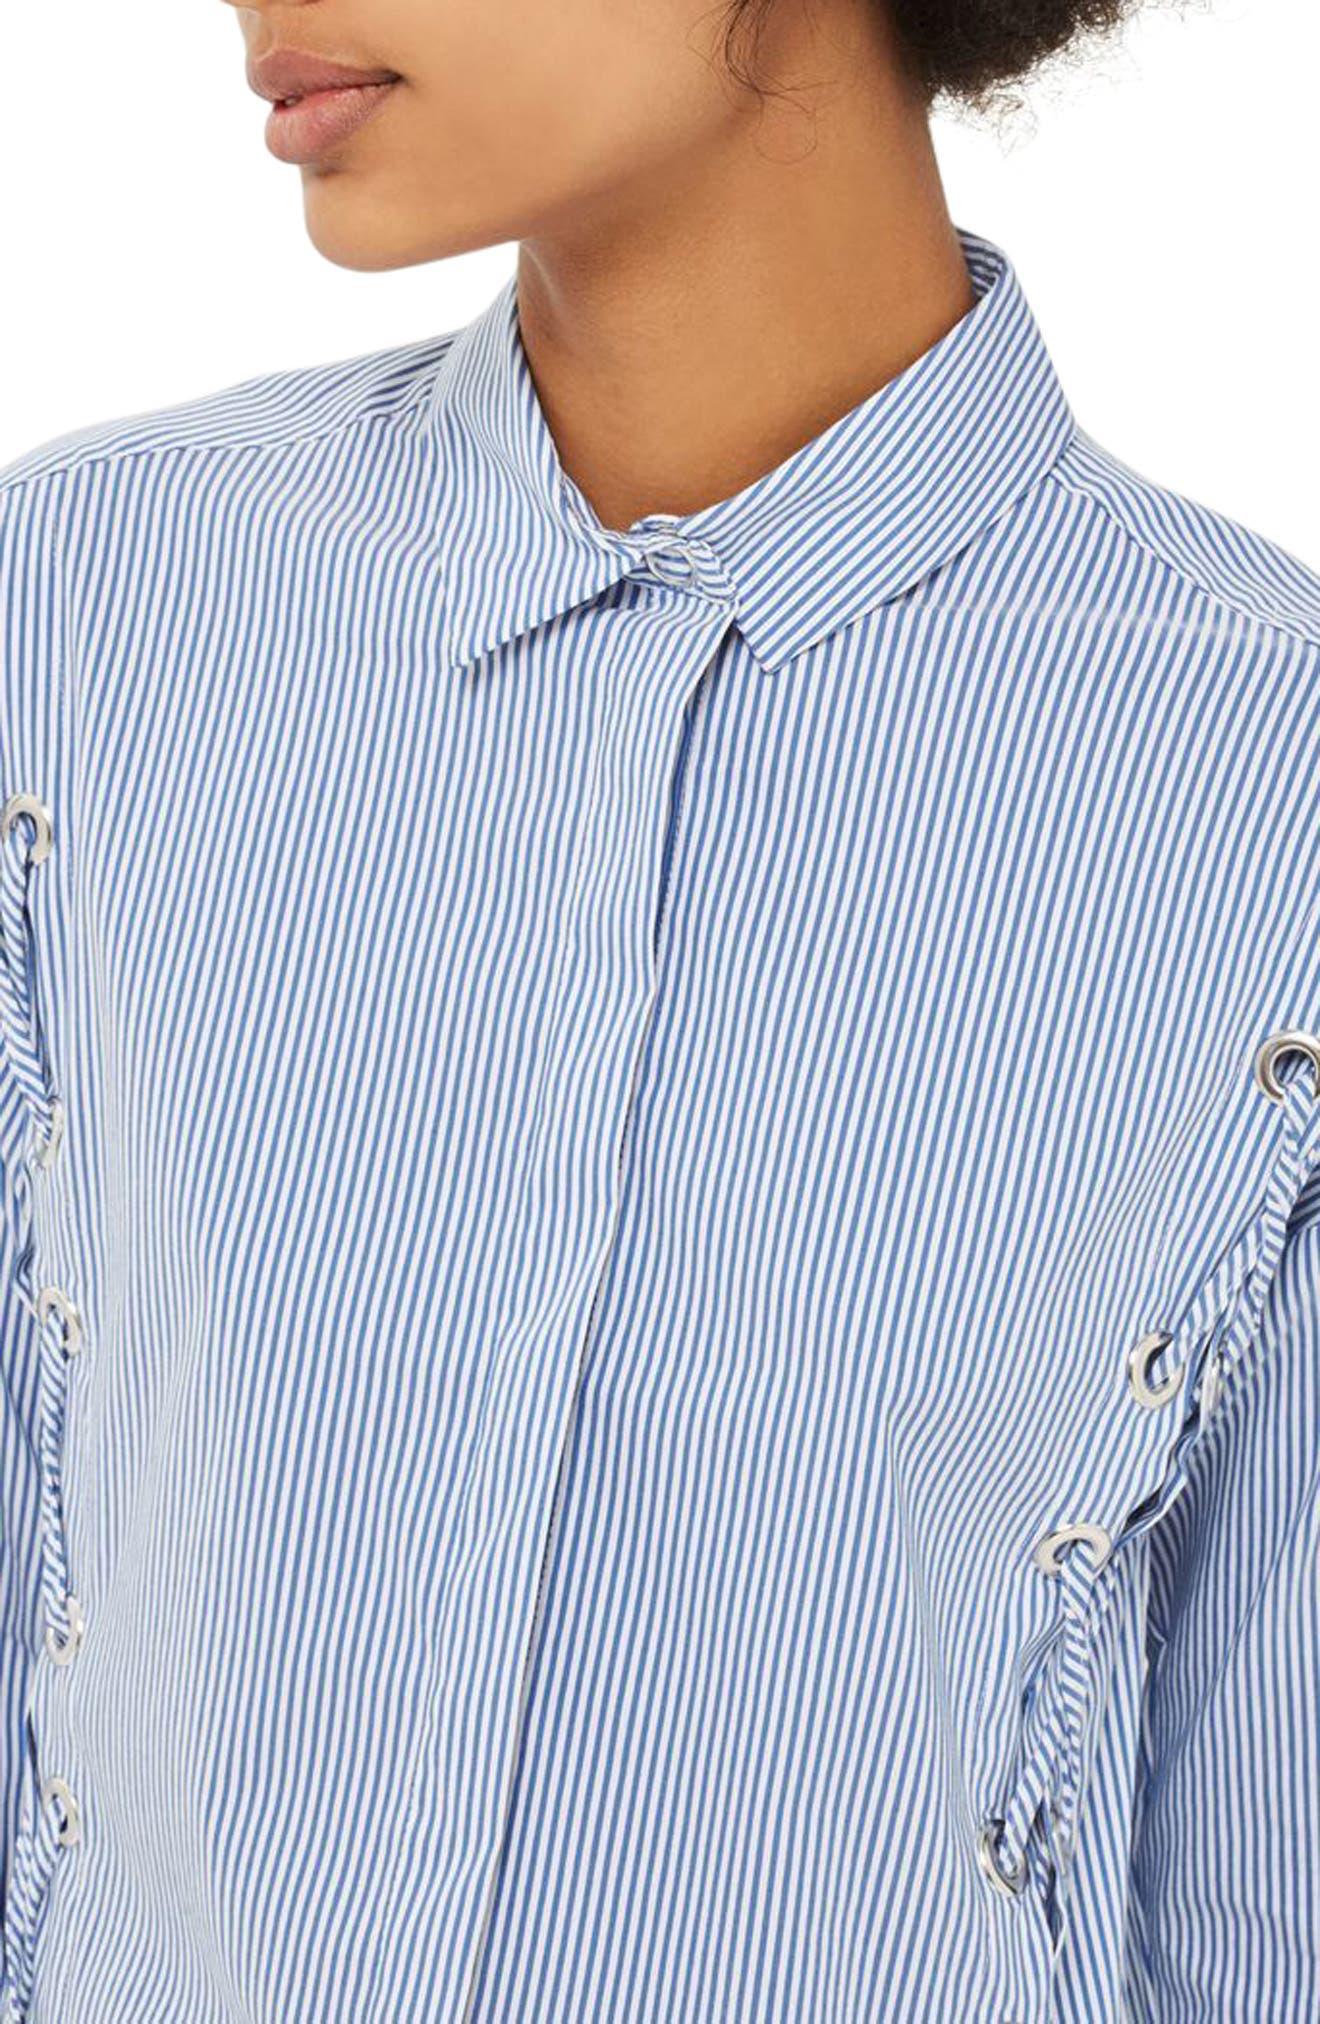 Side Lace-Up Shirt,                             Main thumbnail 1, color,                             400